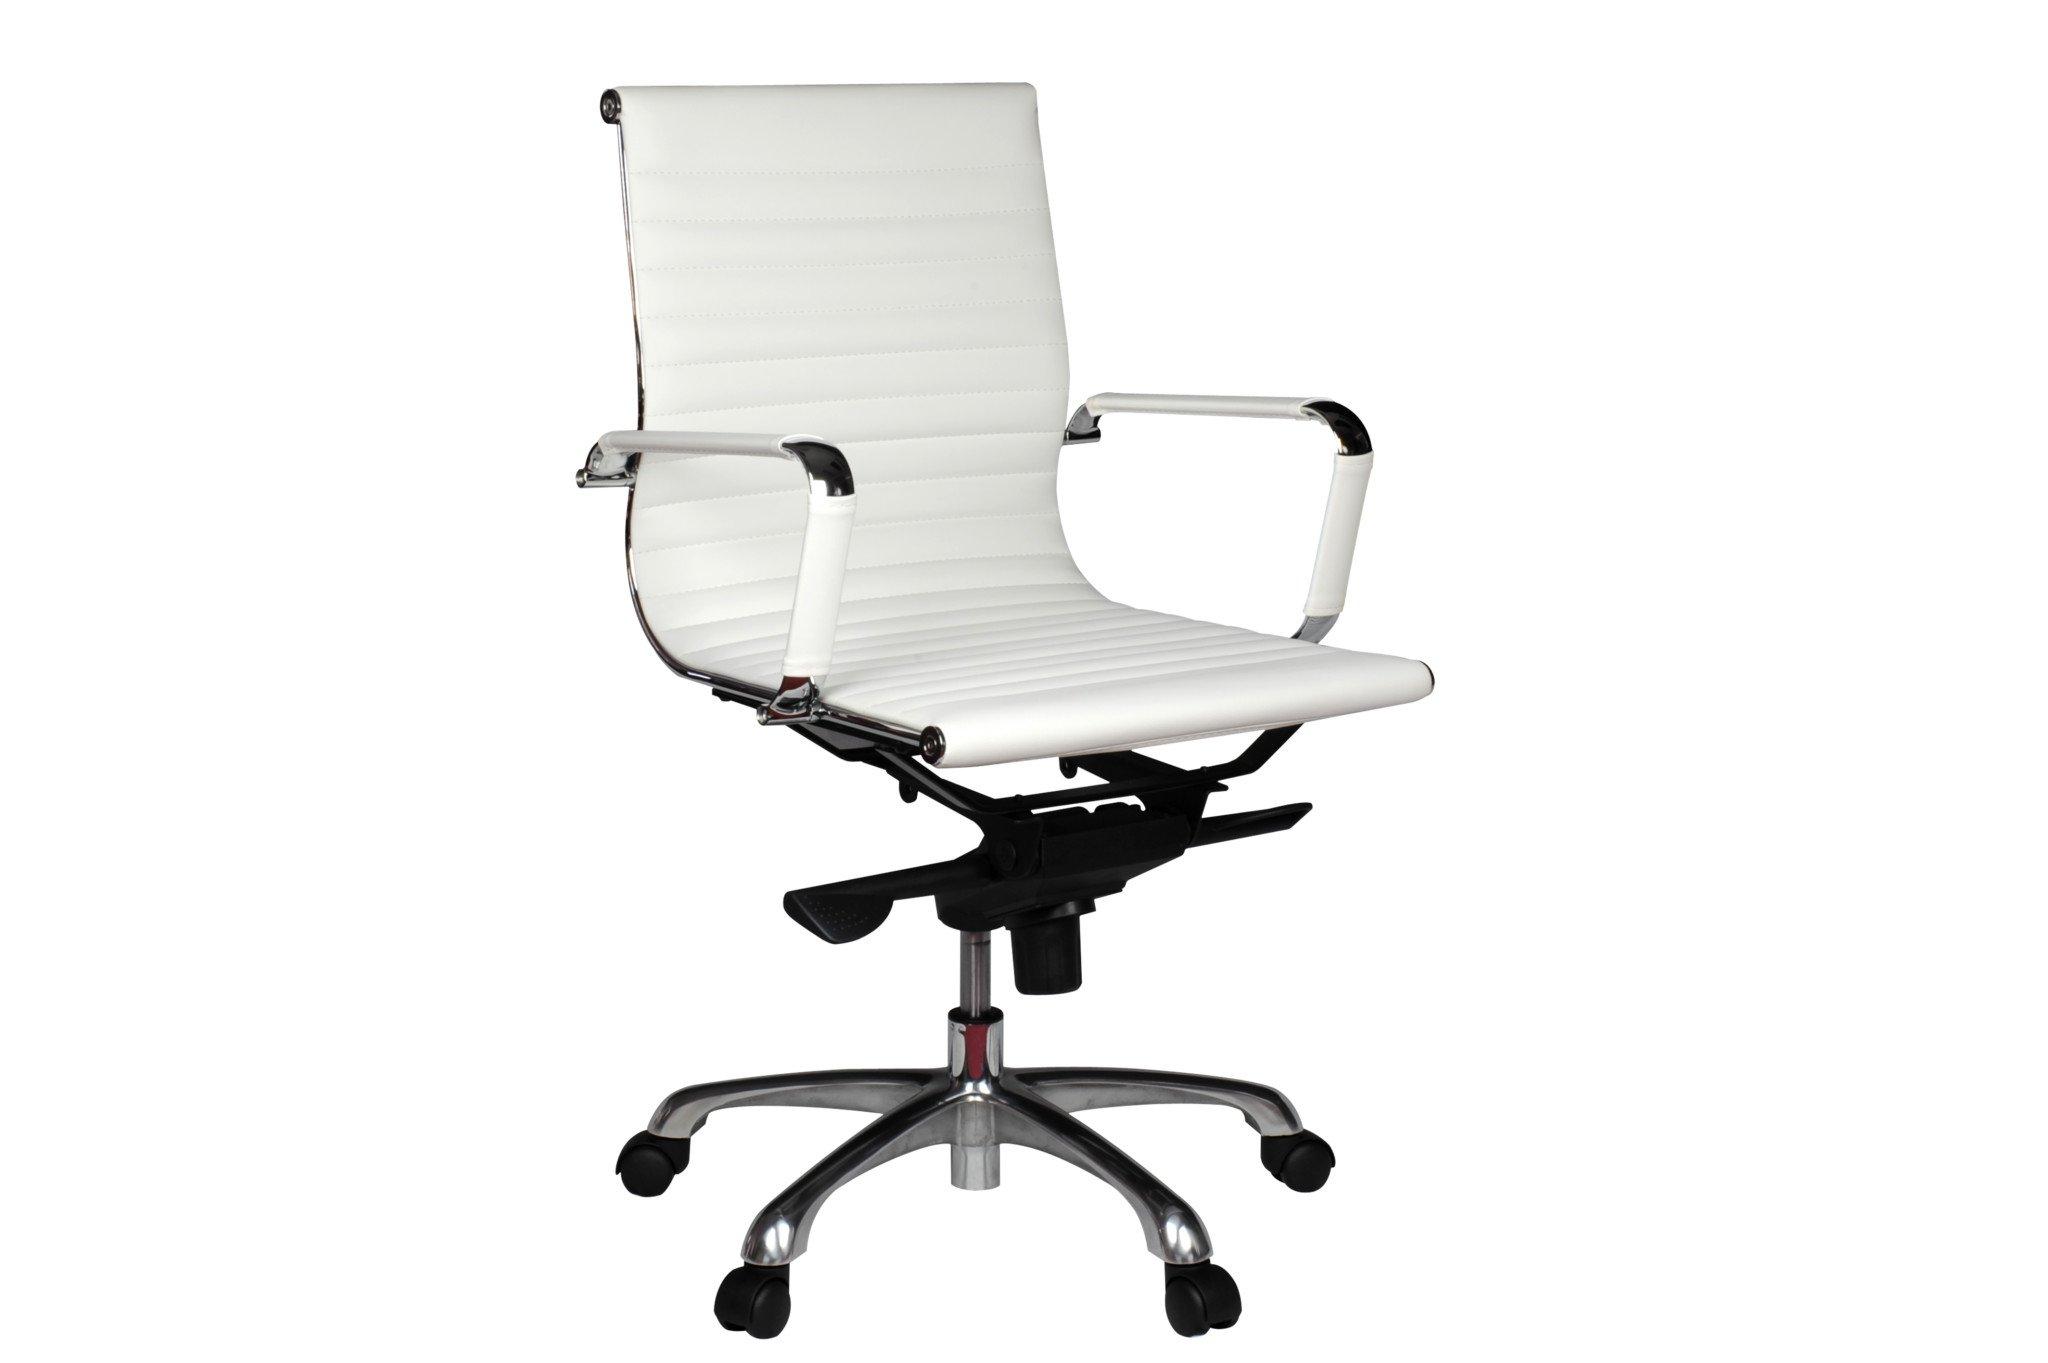 Aero Executive Chair Range